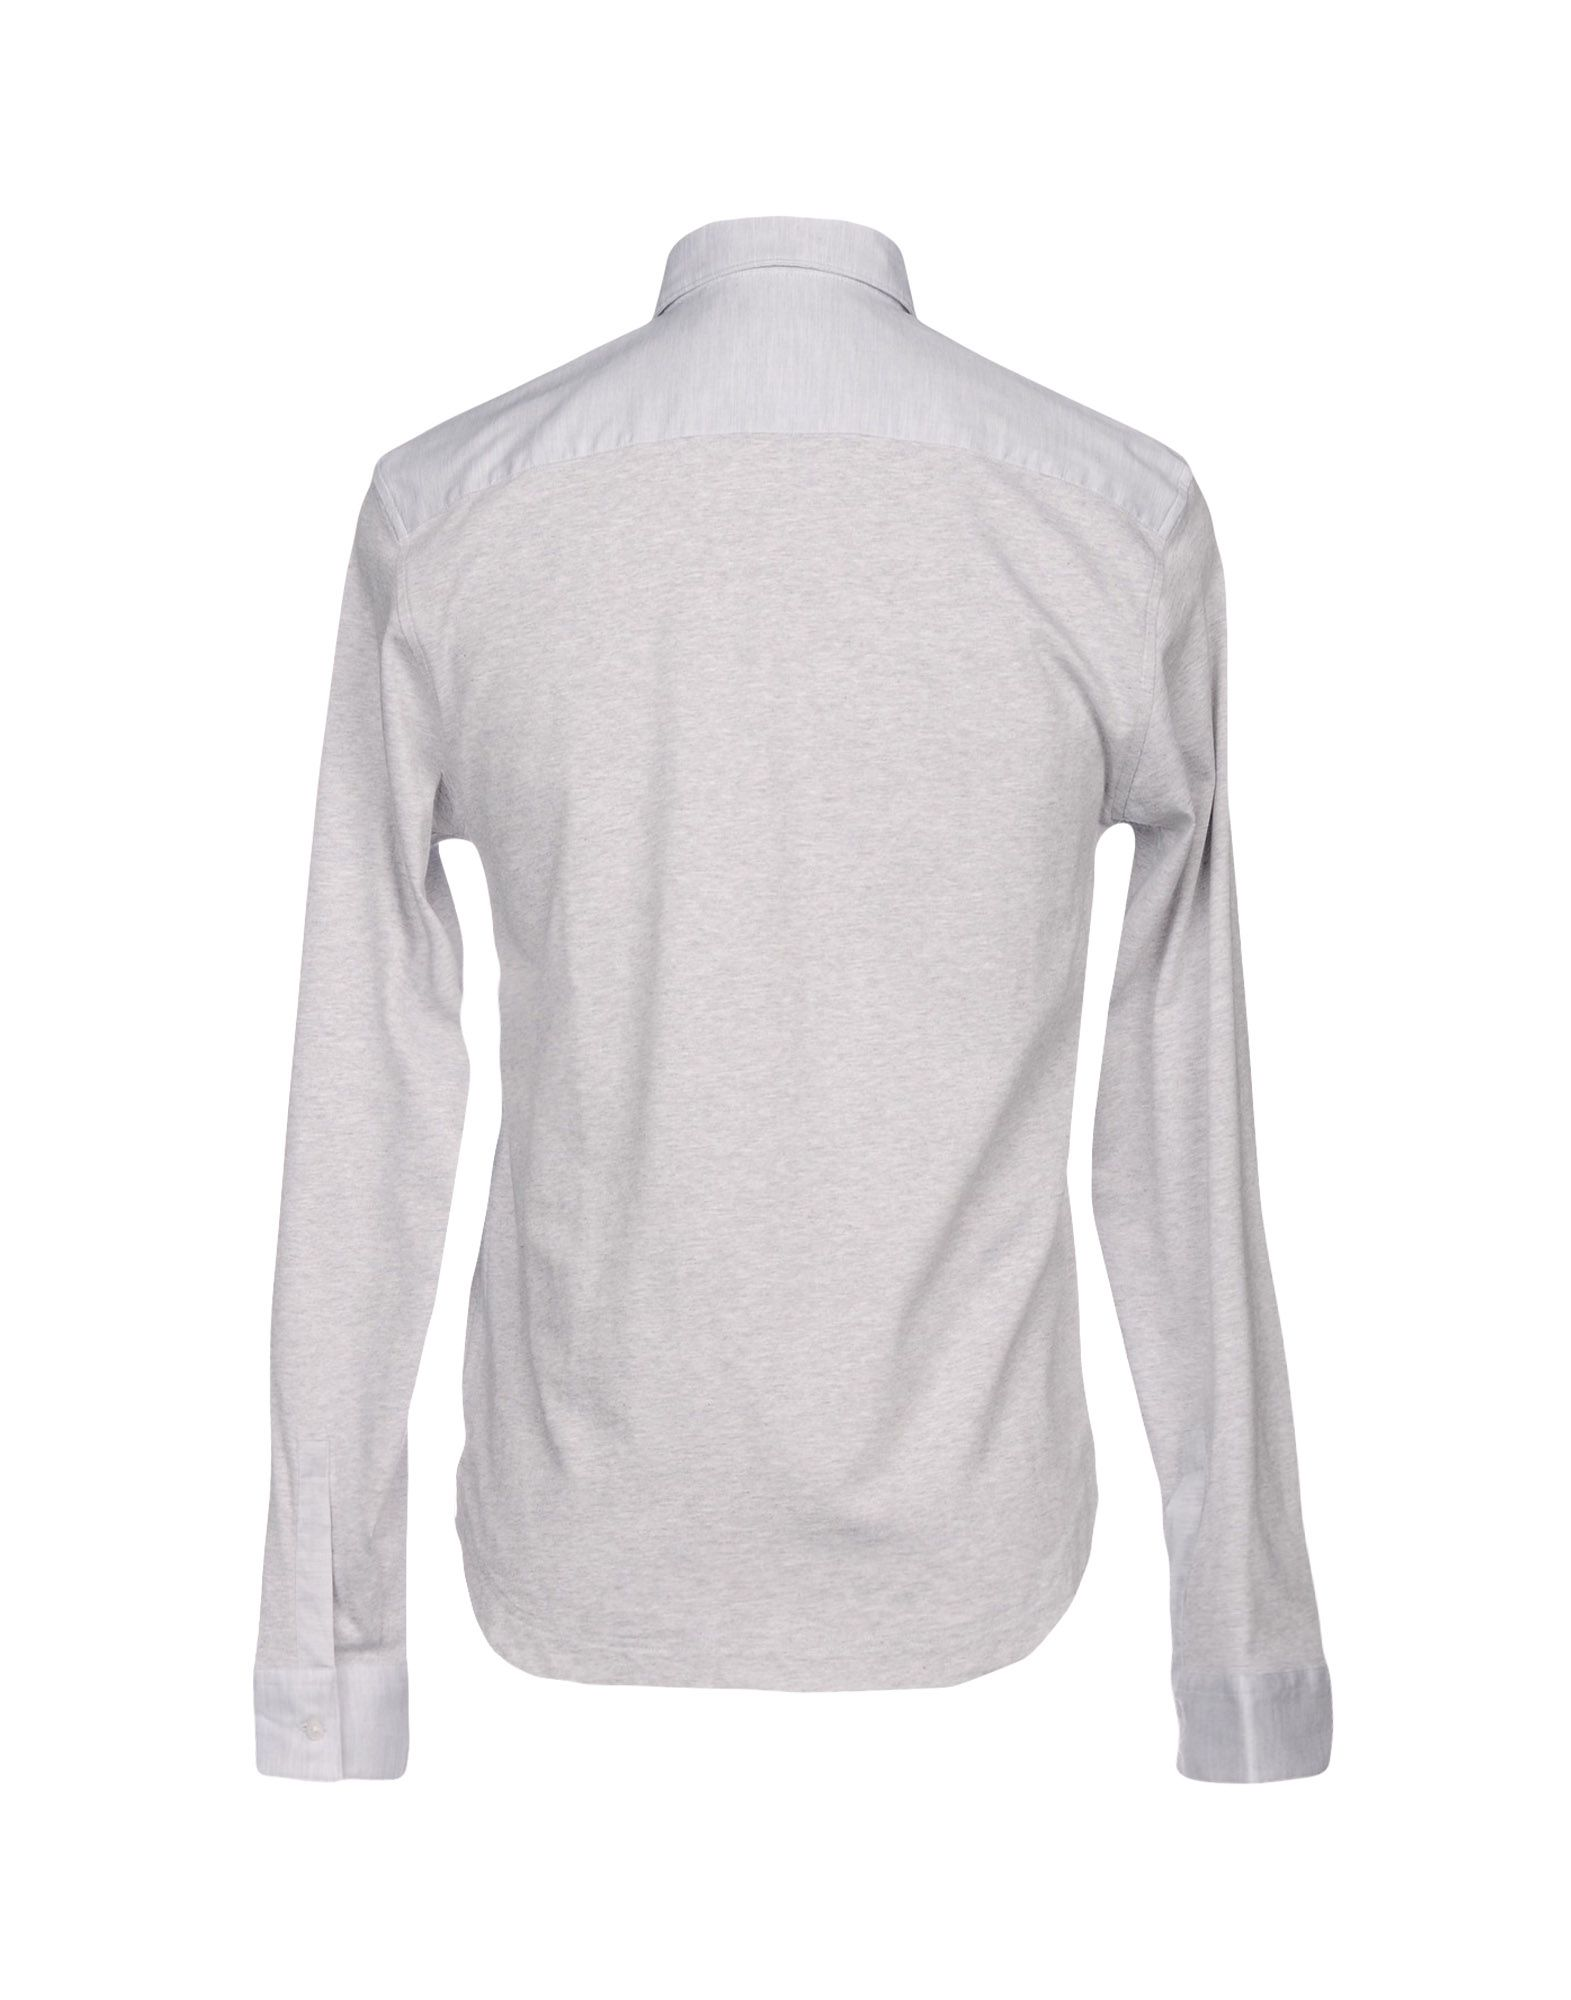 Camicia Tinta Unita Kenzo Uomo - 38726221UV 38726221UV 38726221UV b79875